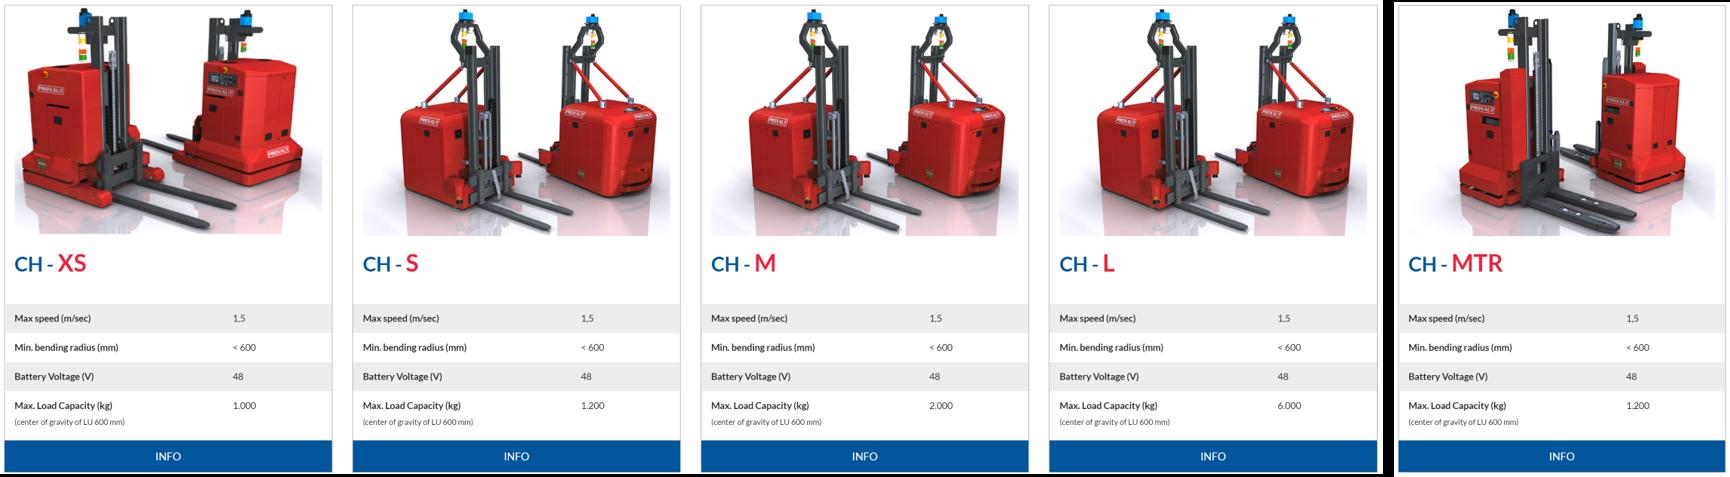 Información sobre la gama de AGVs CHEETAH de Proxaut